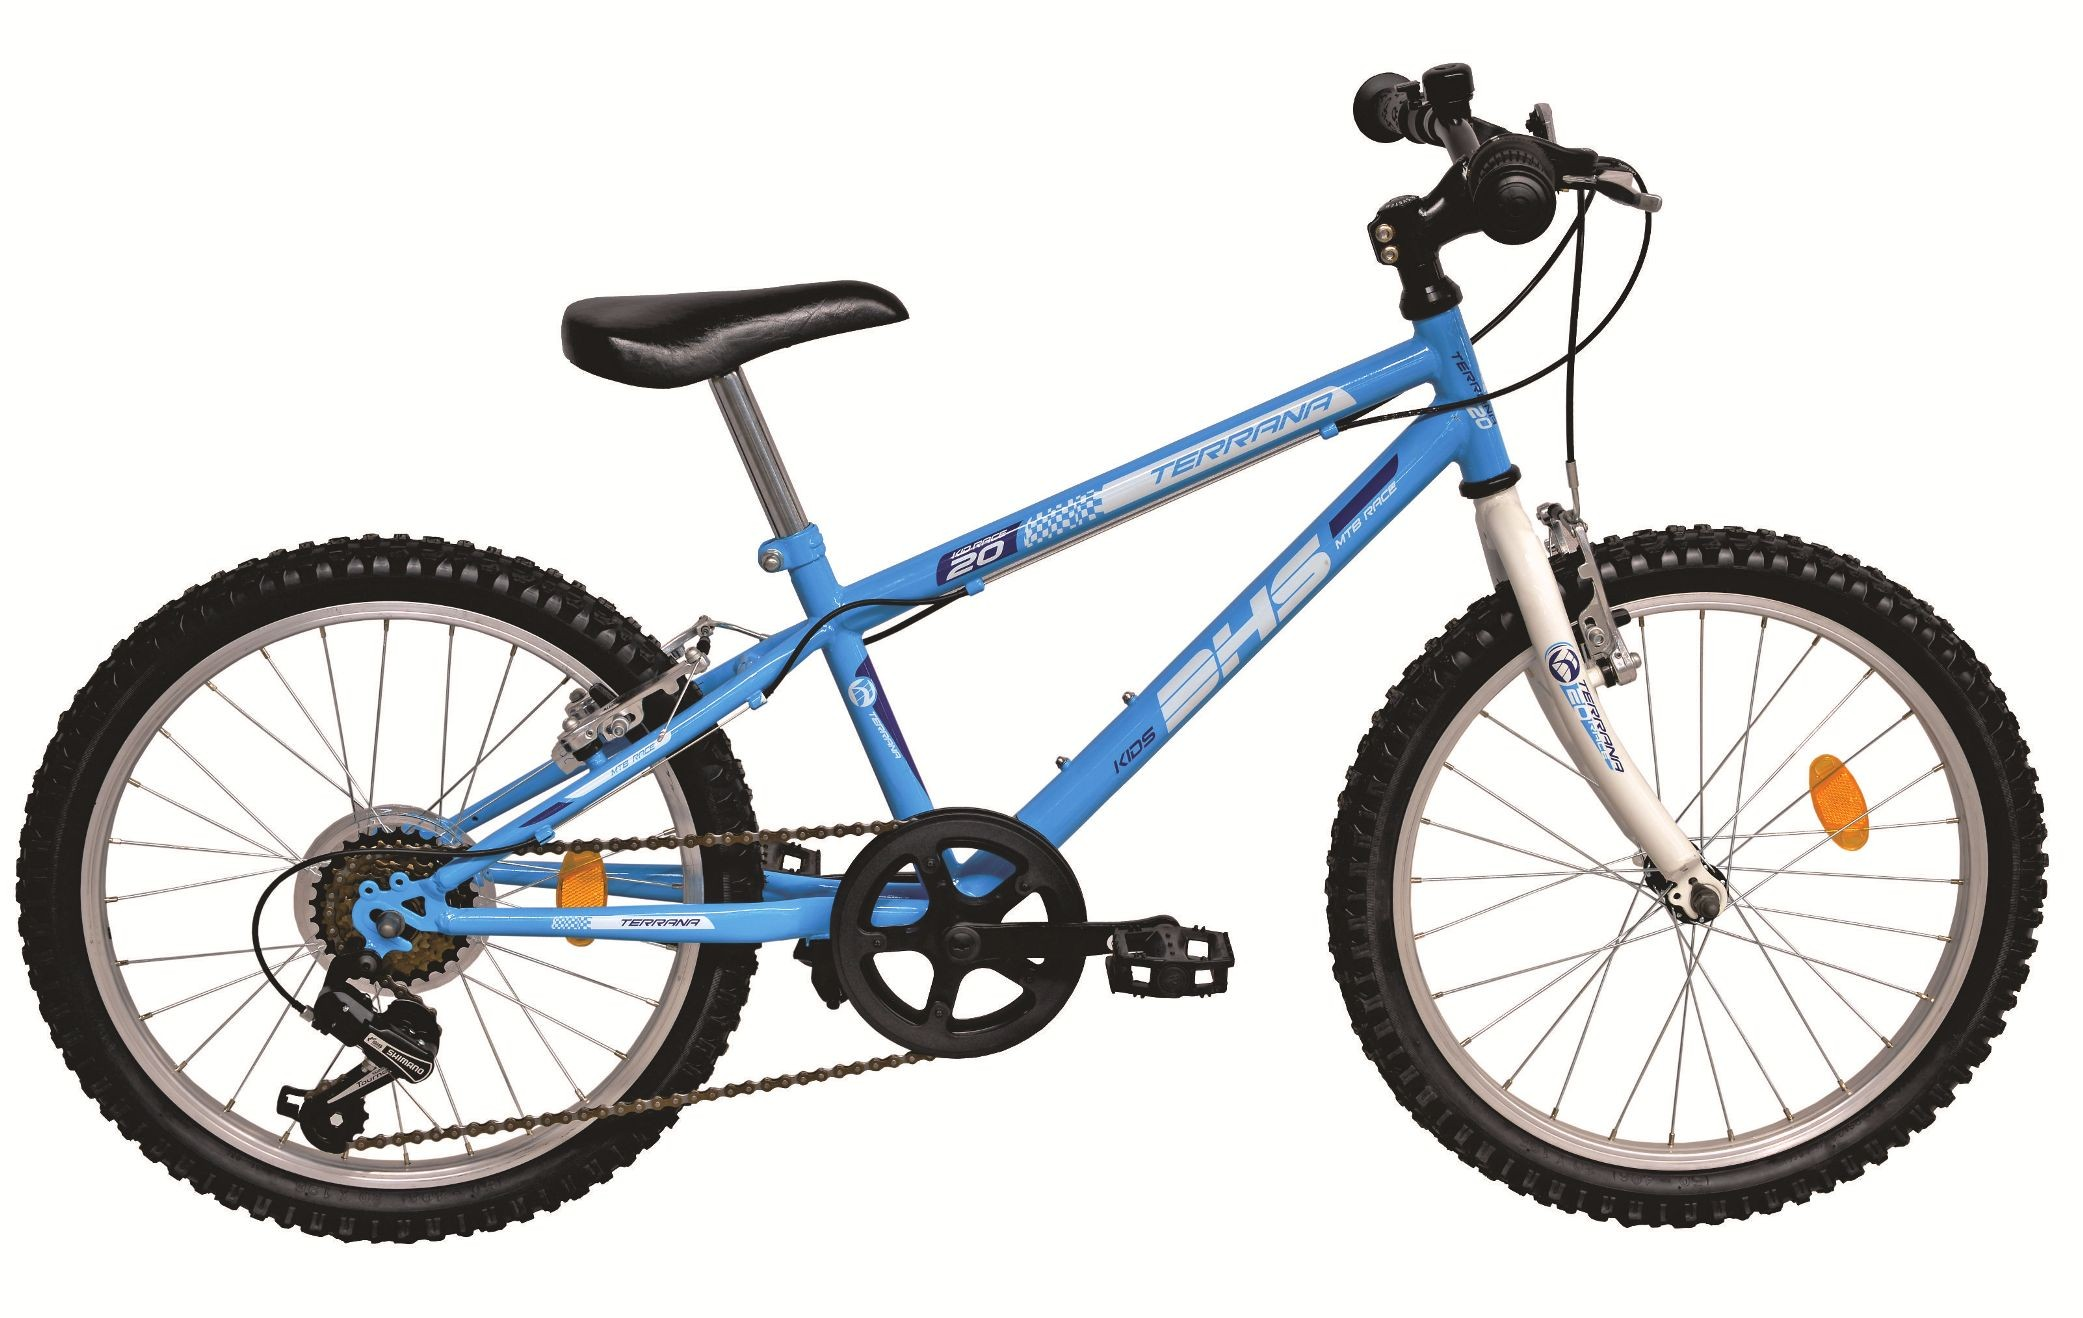 Bicicleta Copii, Dhs, Terrana, 2021 (2016), Cadru Mtb Otel